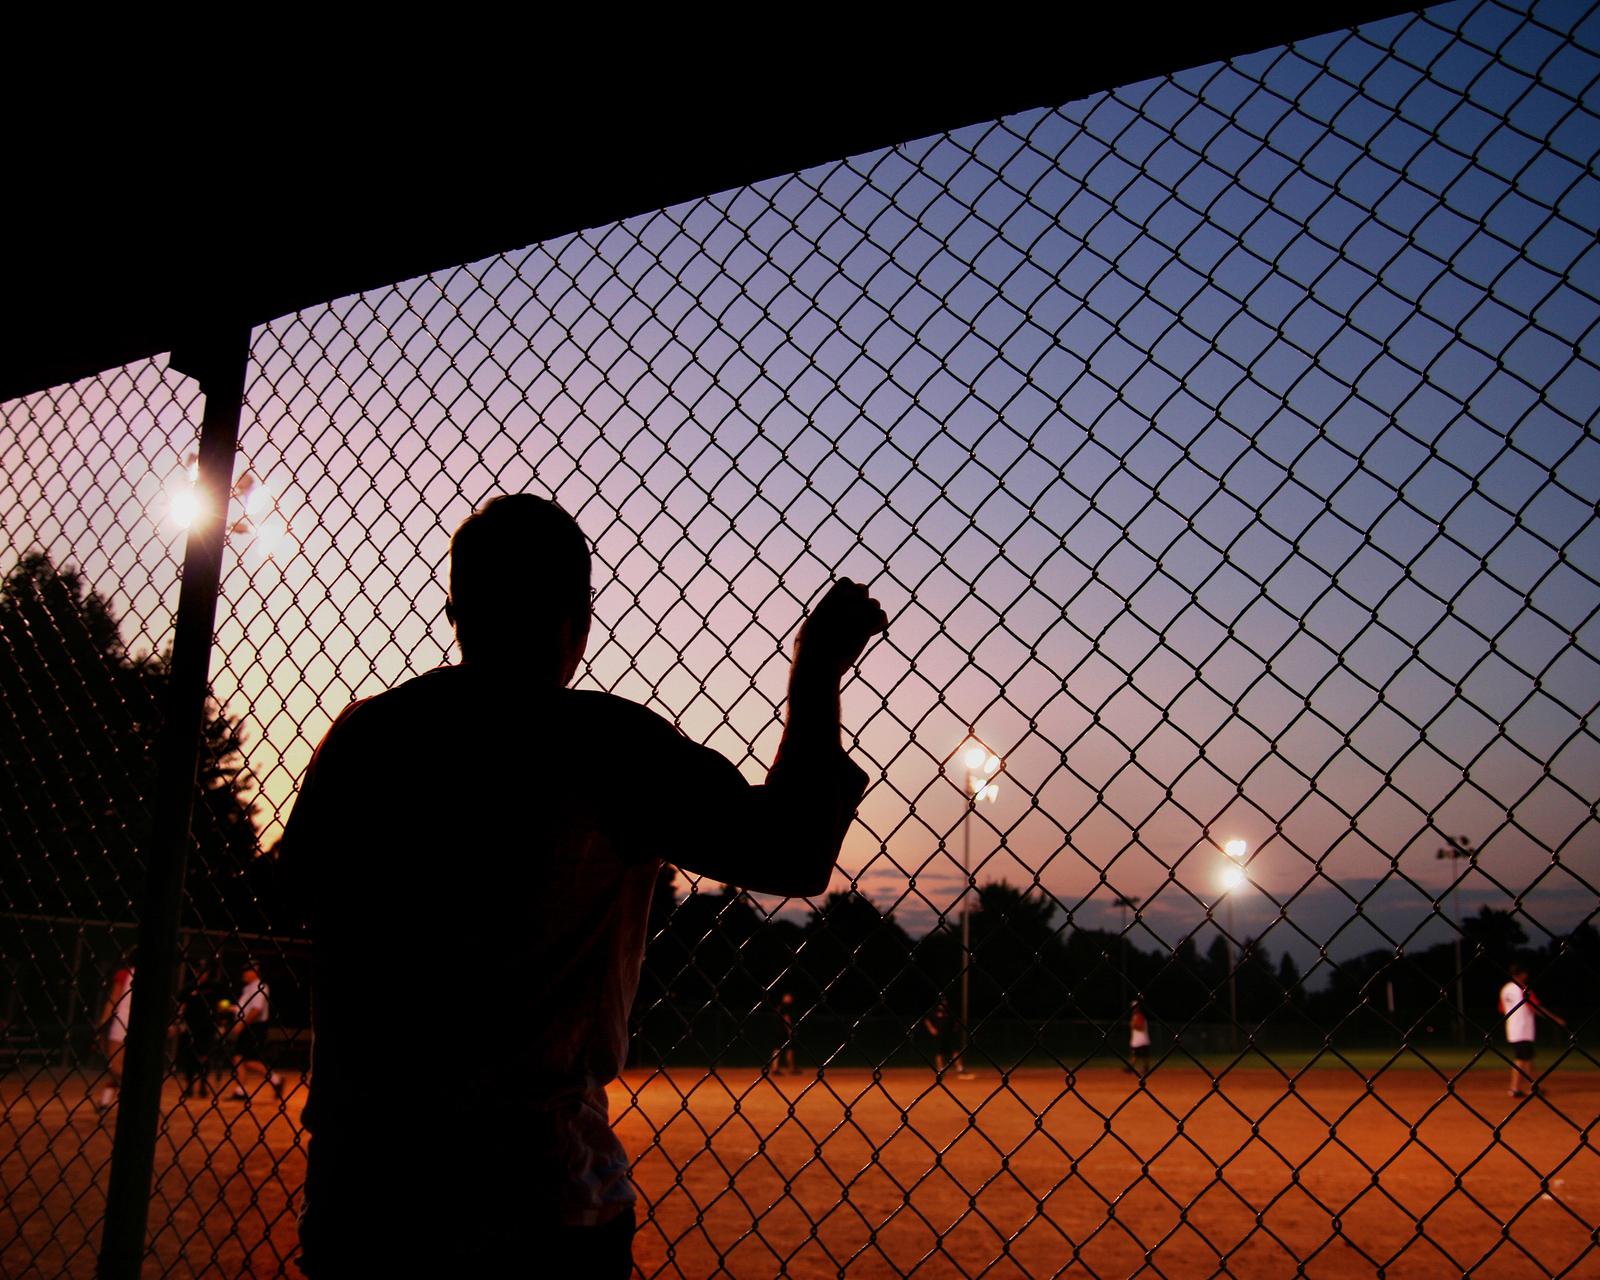 baseball-night-game